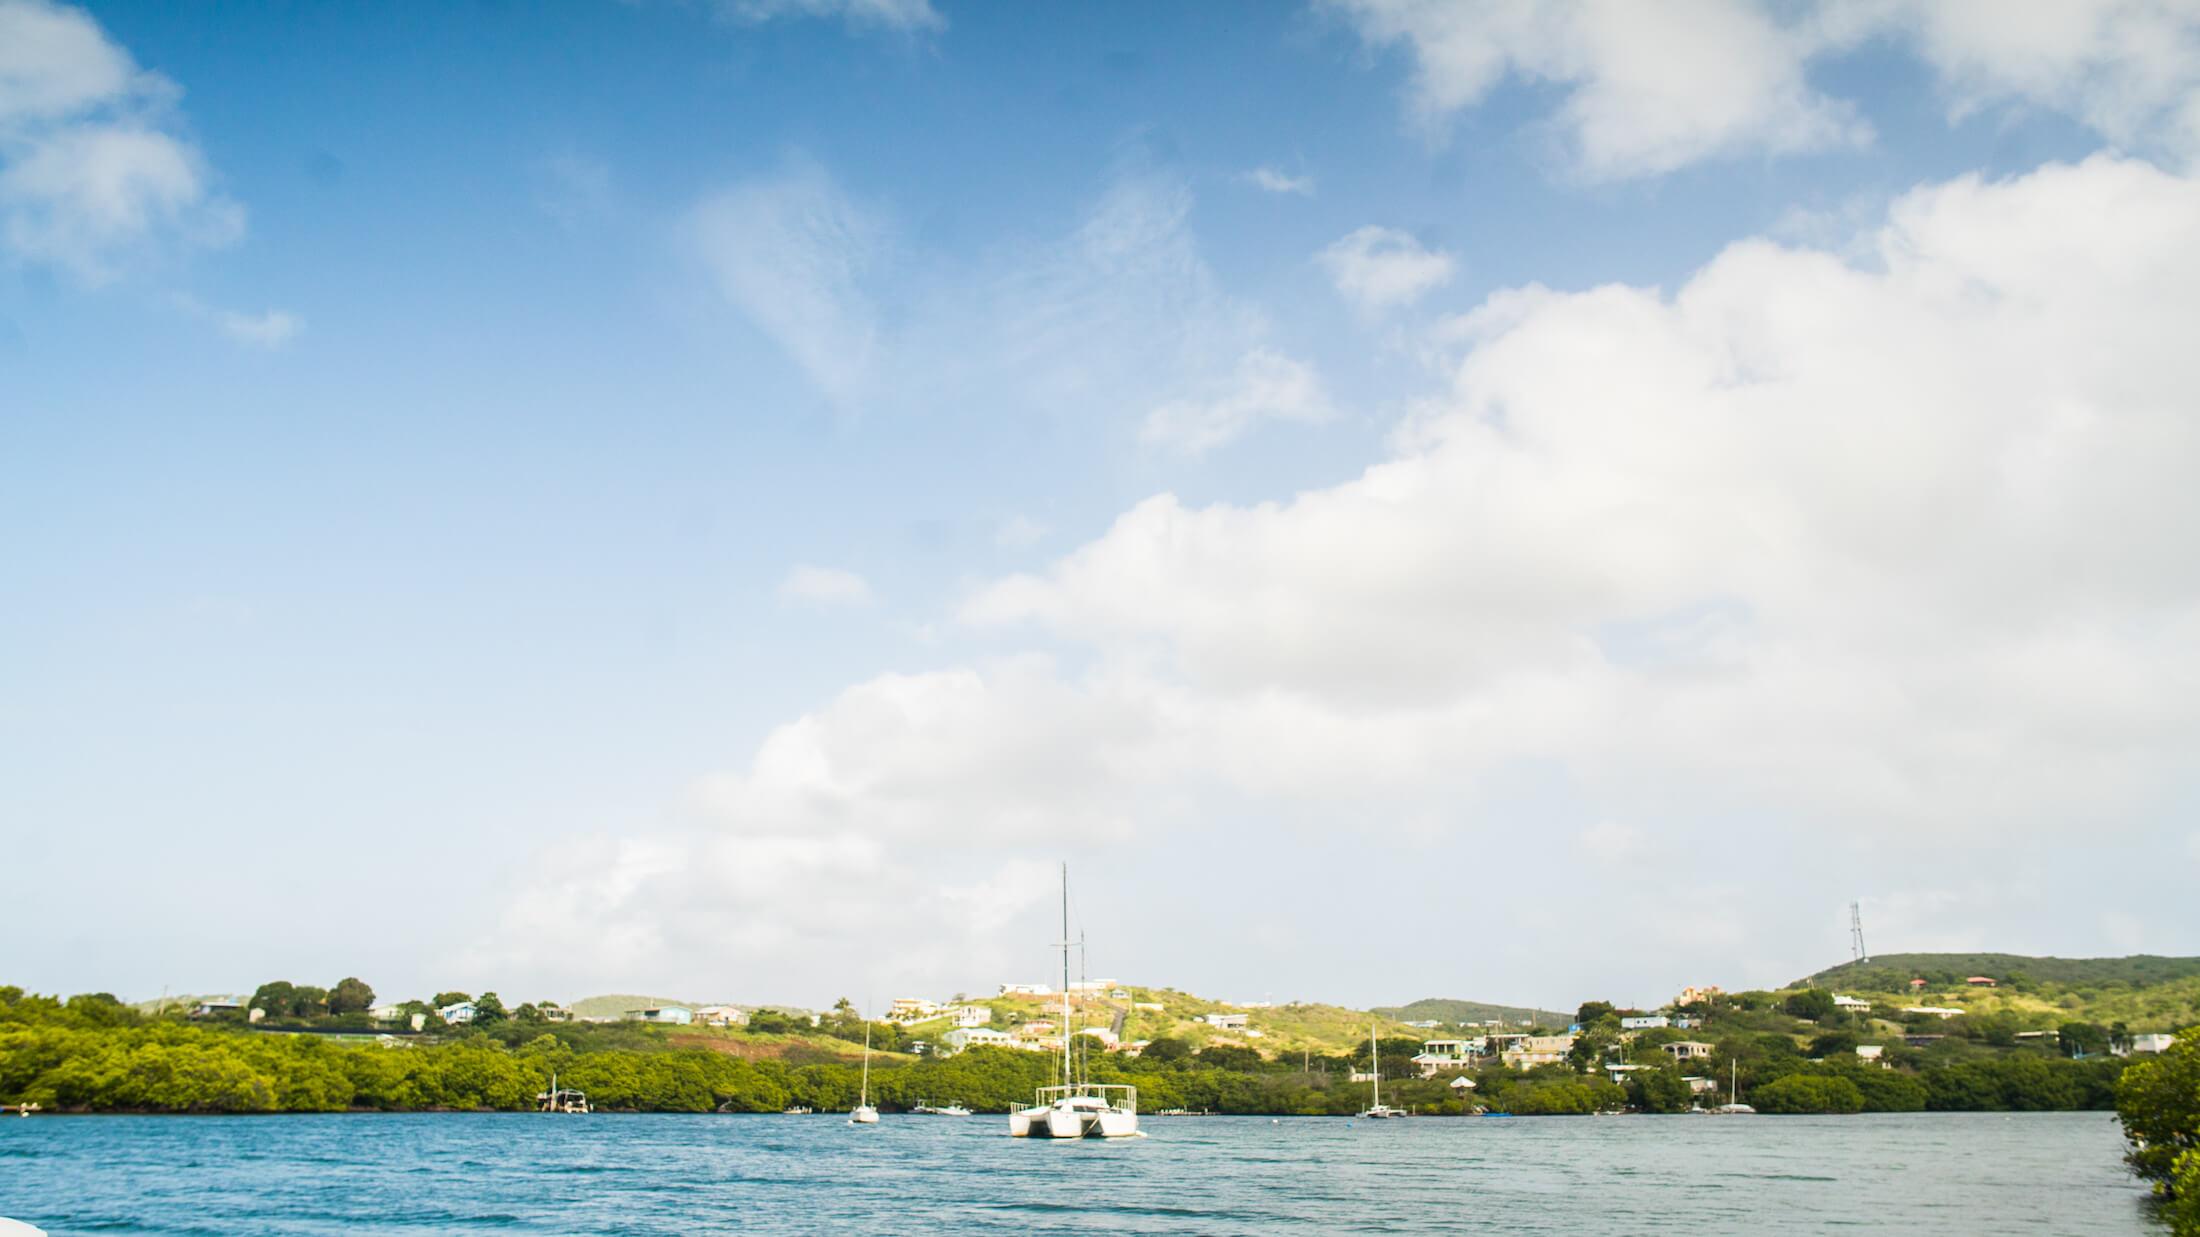 engle-olson-photography-puerto-rico-25.jpg